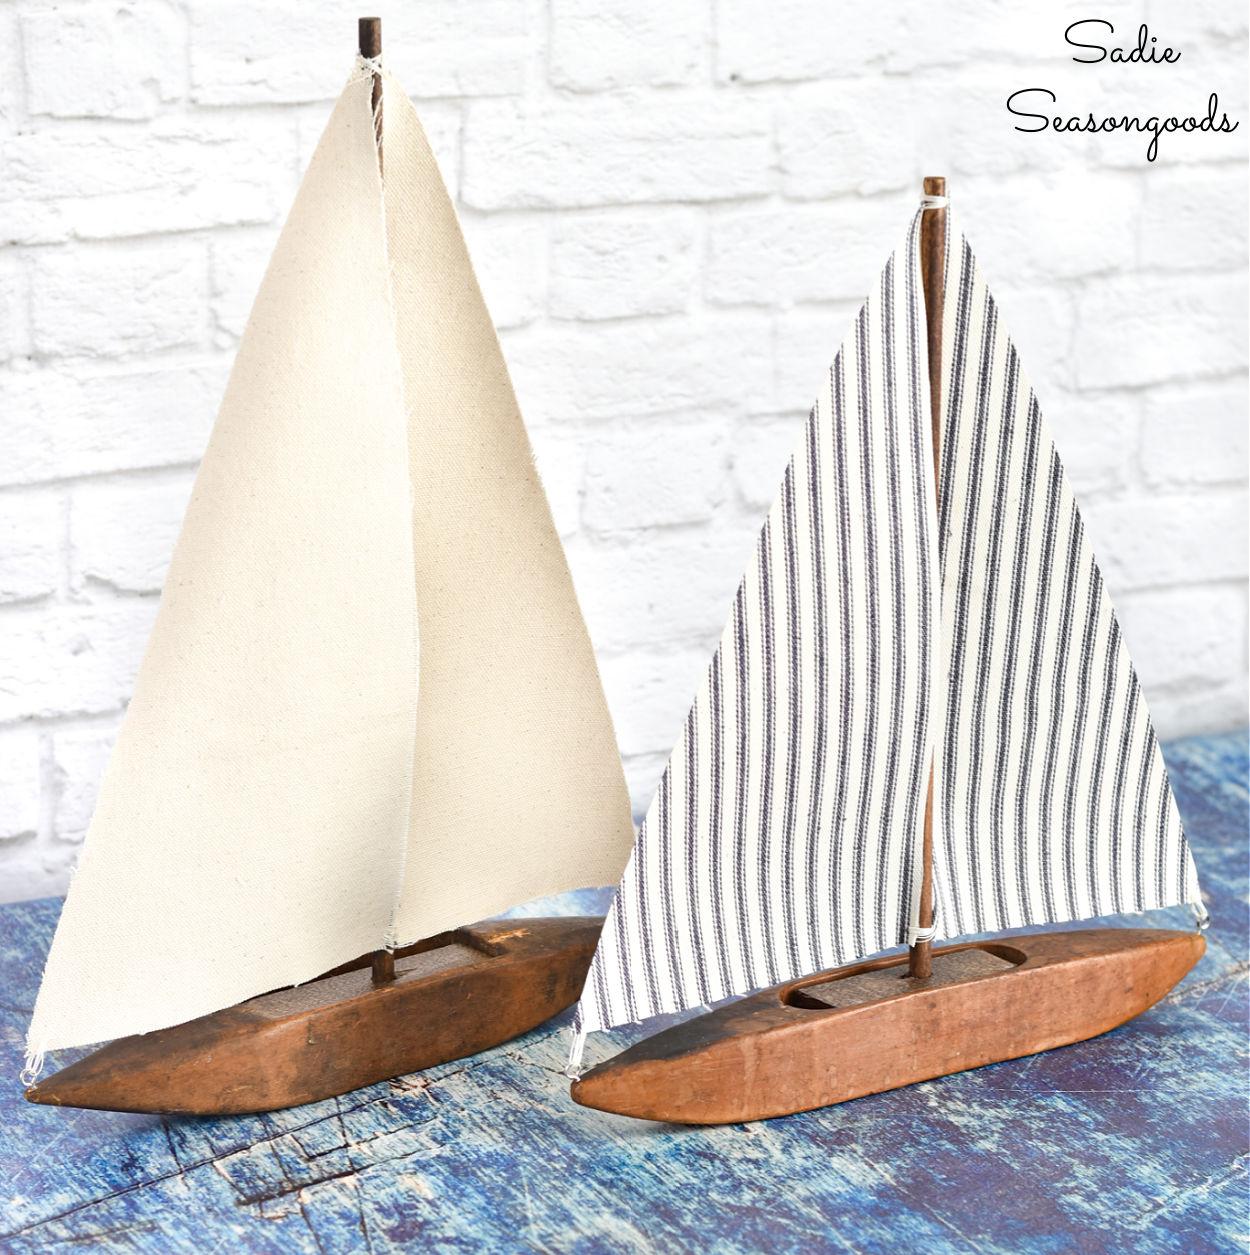 Sailboat Decor from a Weaving Shuttle